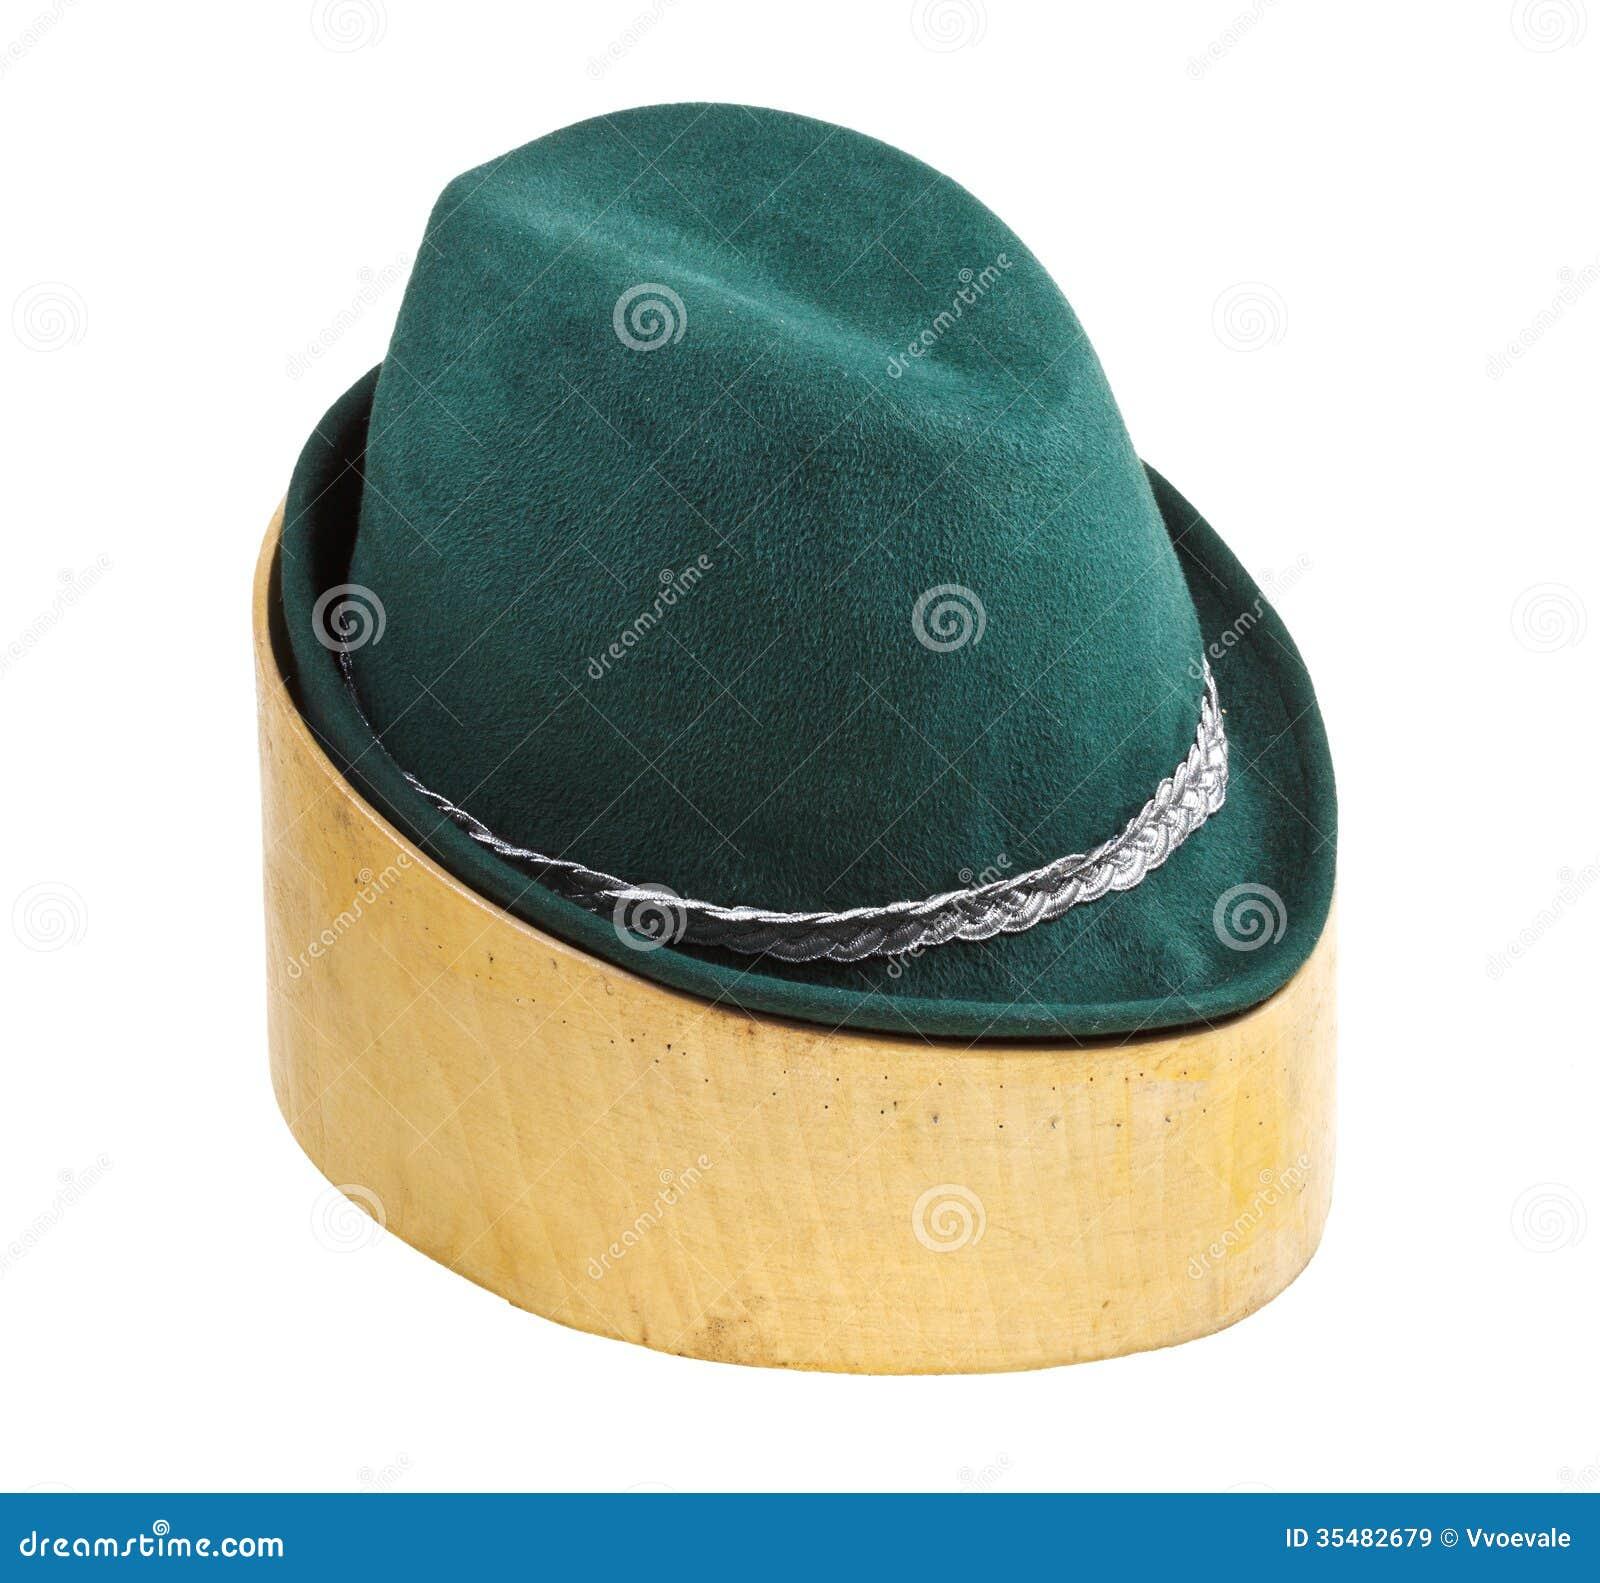 Sombrero De Fieltro Tirolés Verde En Bloque De Madera Del Tilo ... 111c36600c94